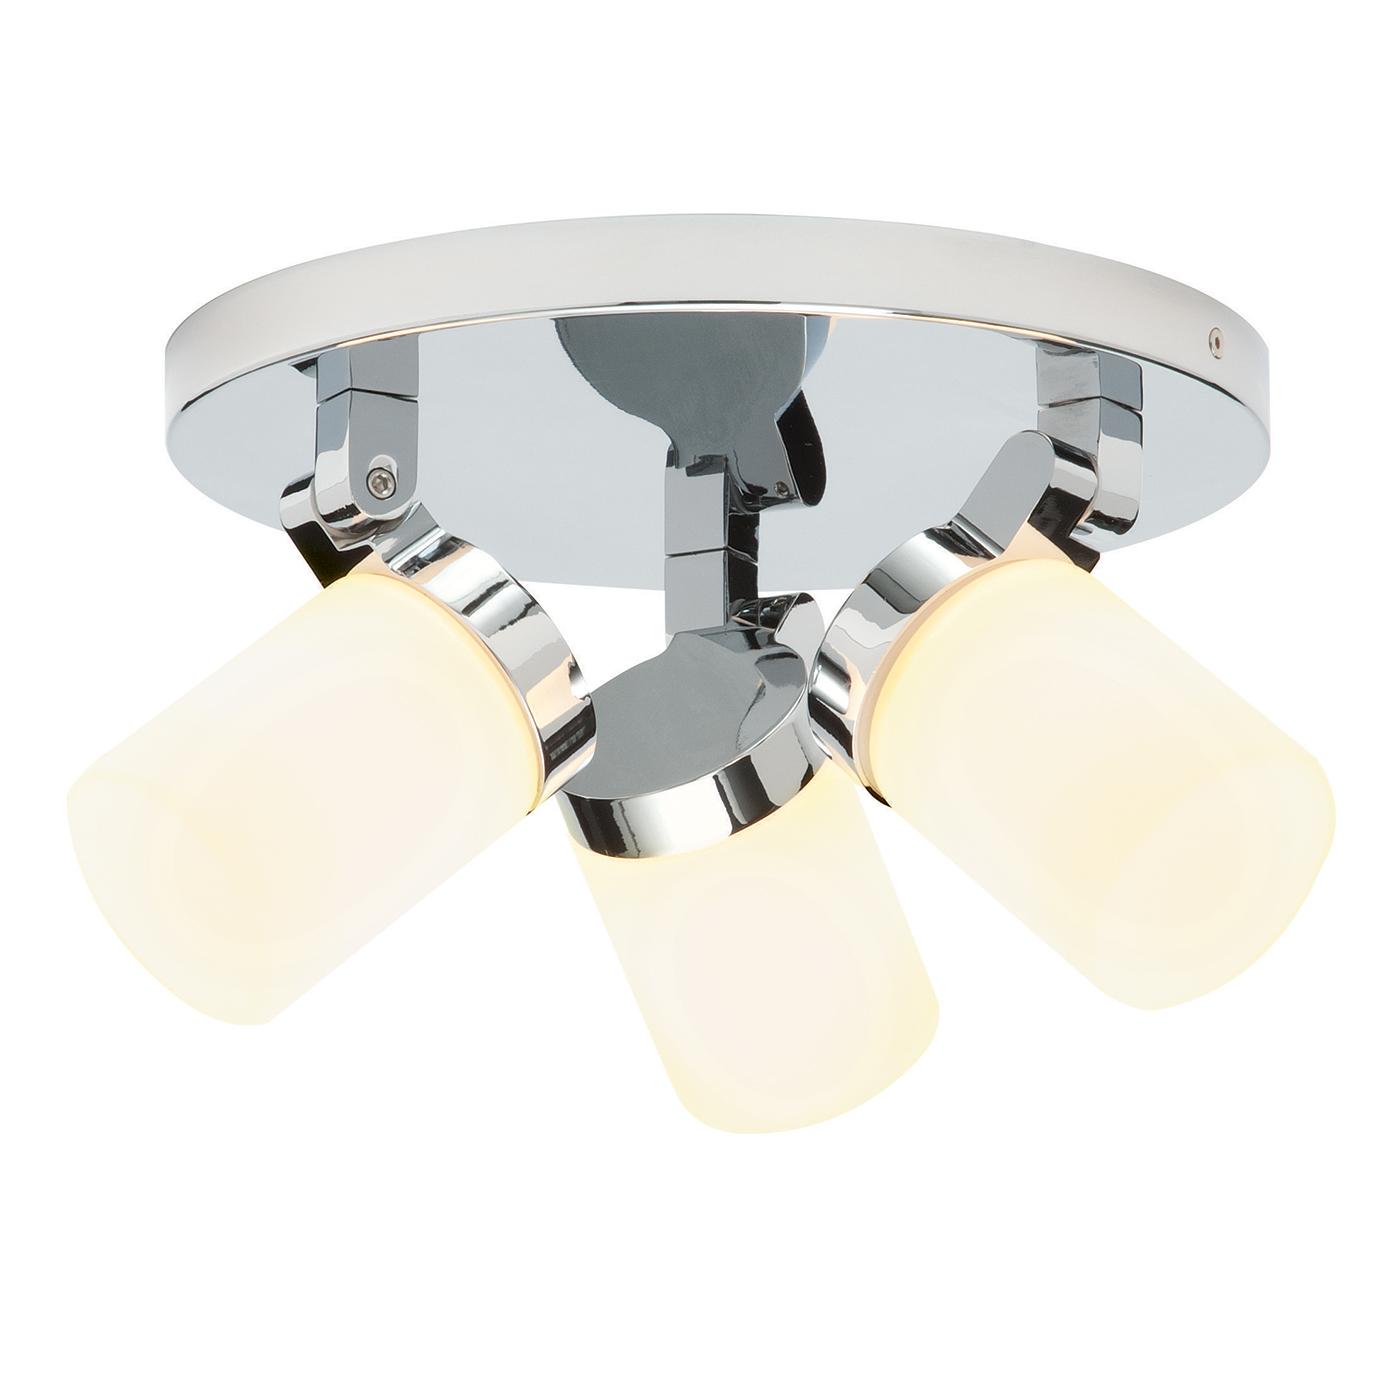 Endon 39617 Spotlight Plate G9 3x25W Ch